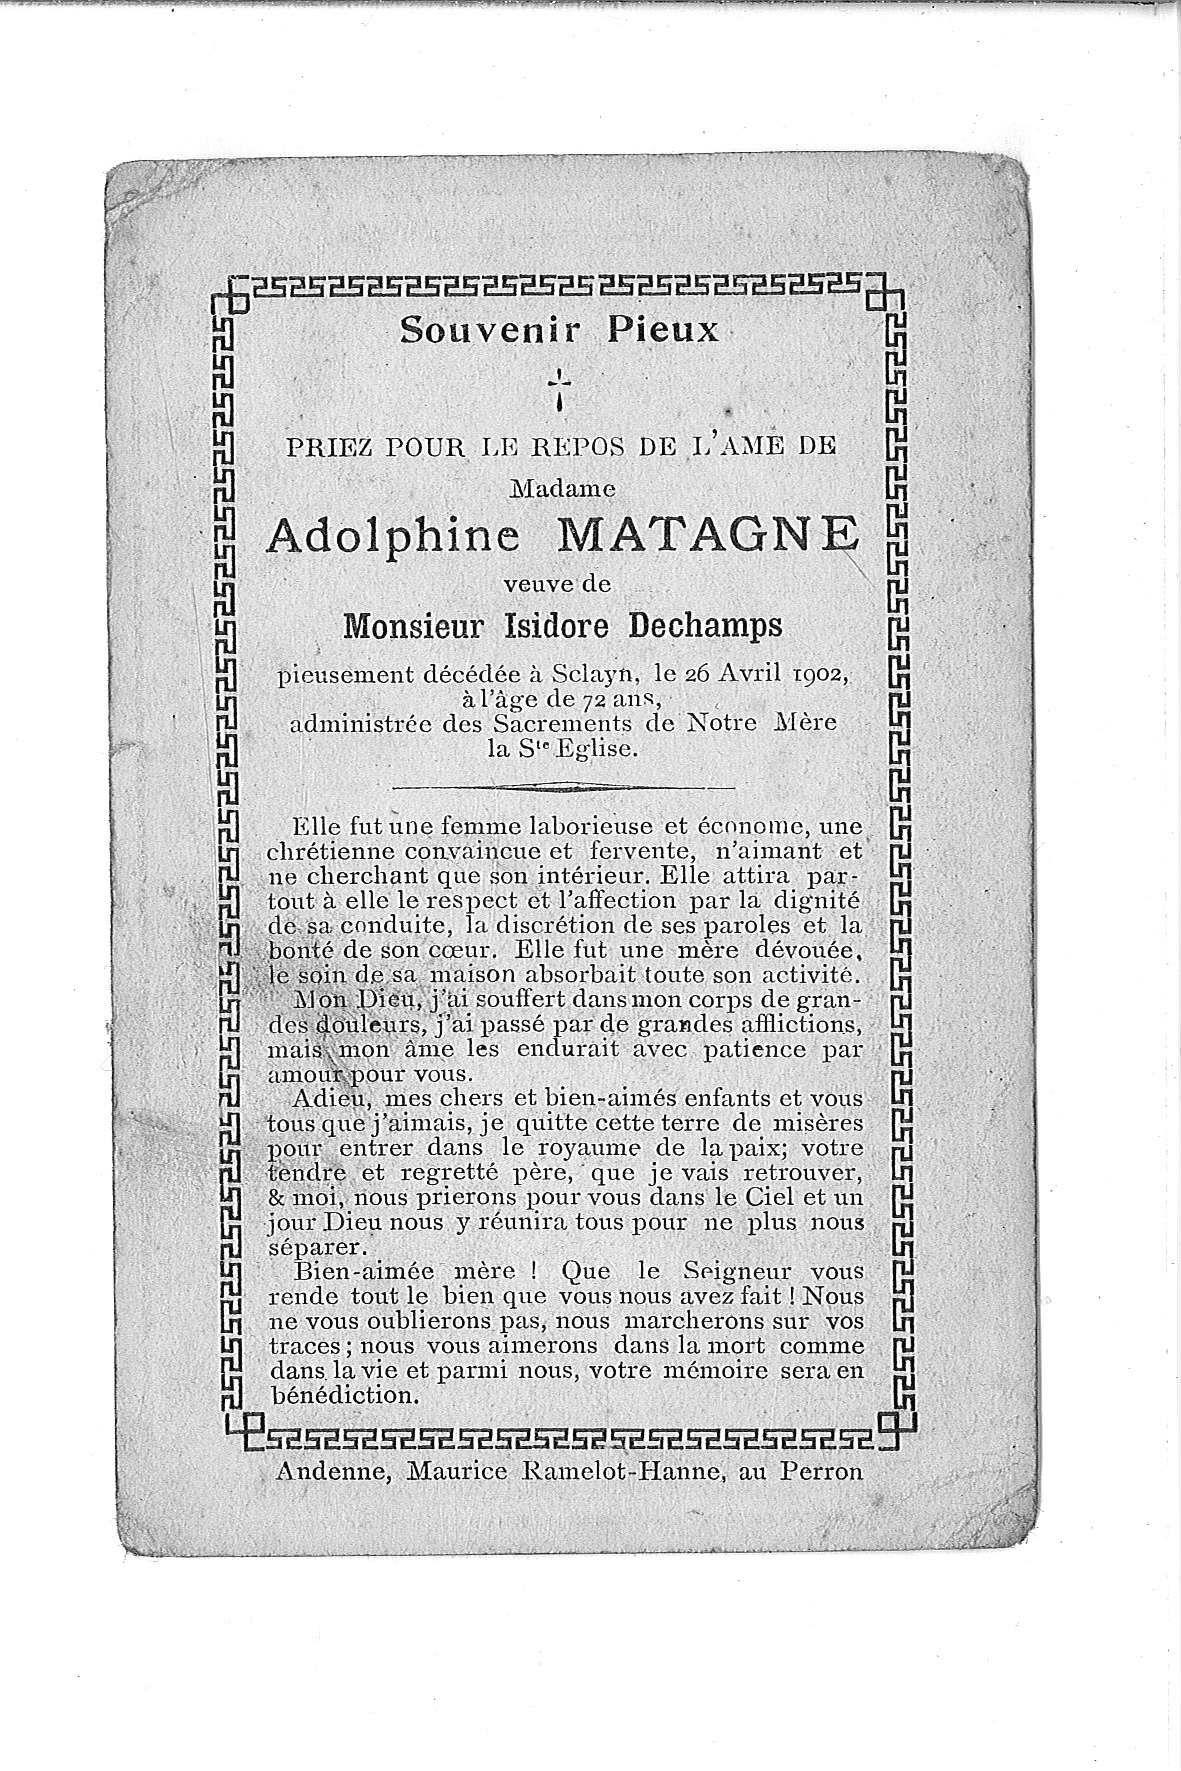 Adolphine(1902)20120412120820_00001.jpg